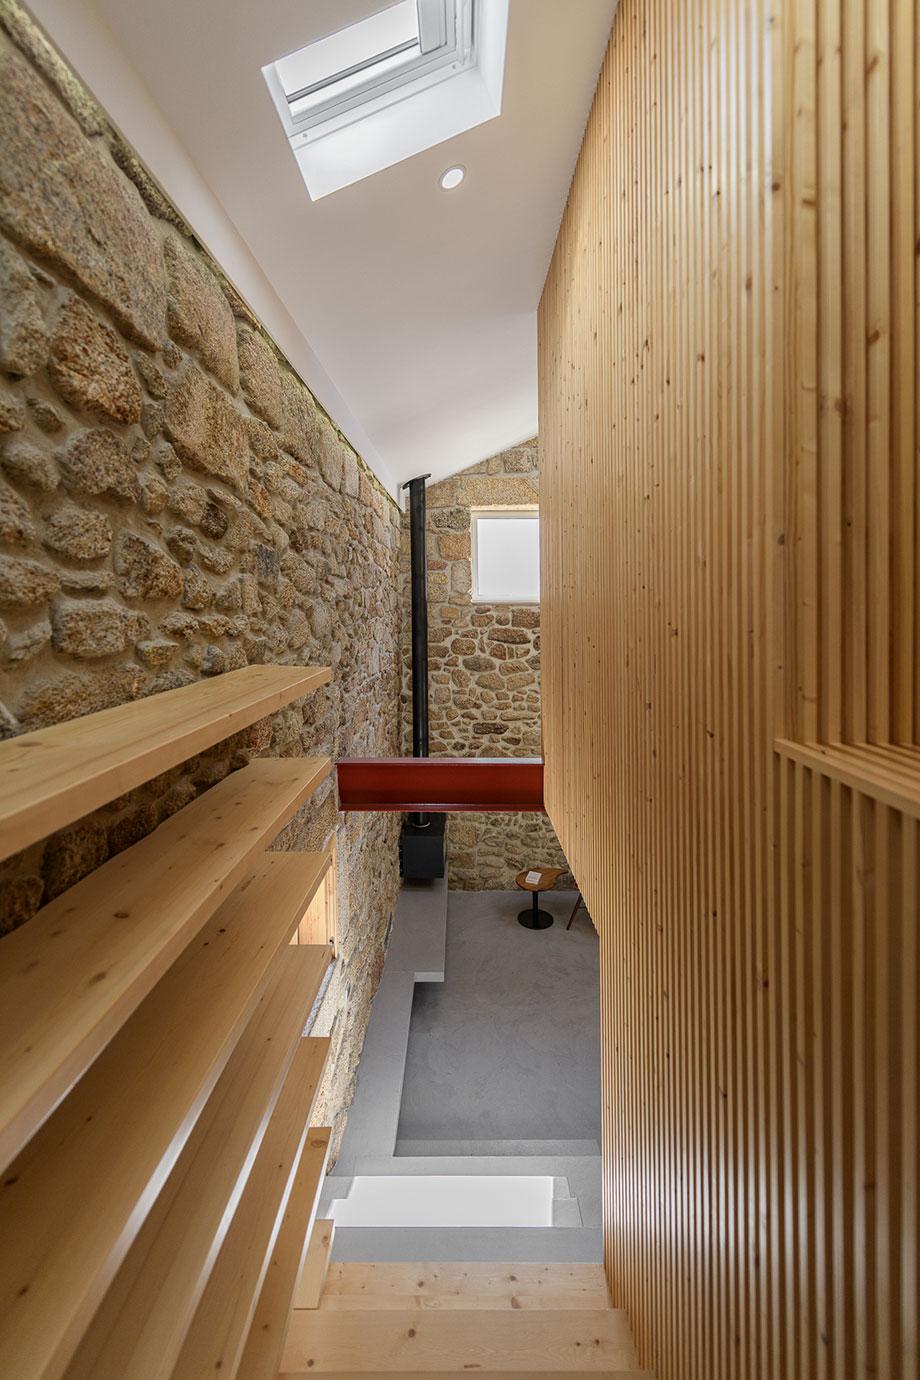 casa rural en portugal de hbg architects (13) - foto ricardo oliveira alves